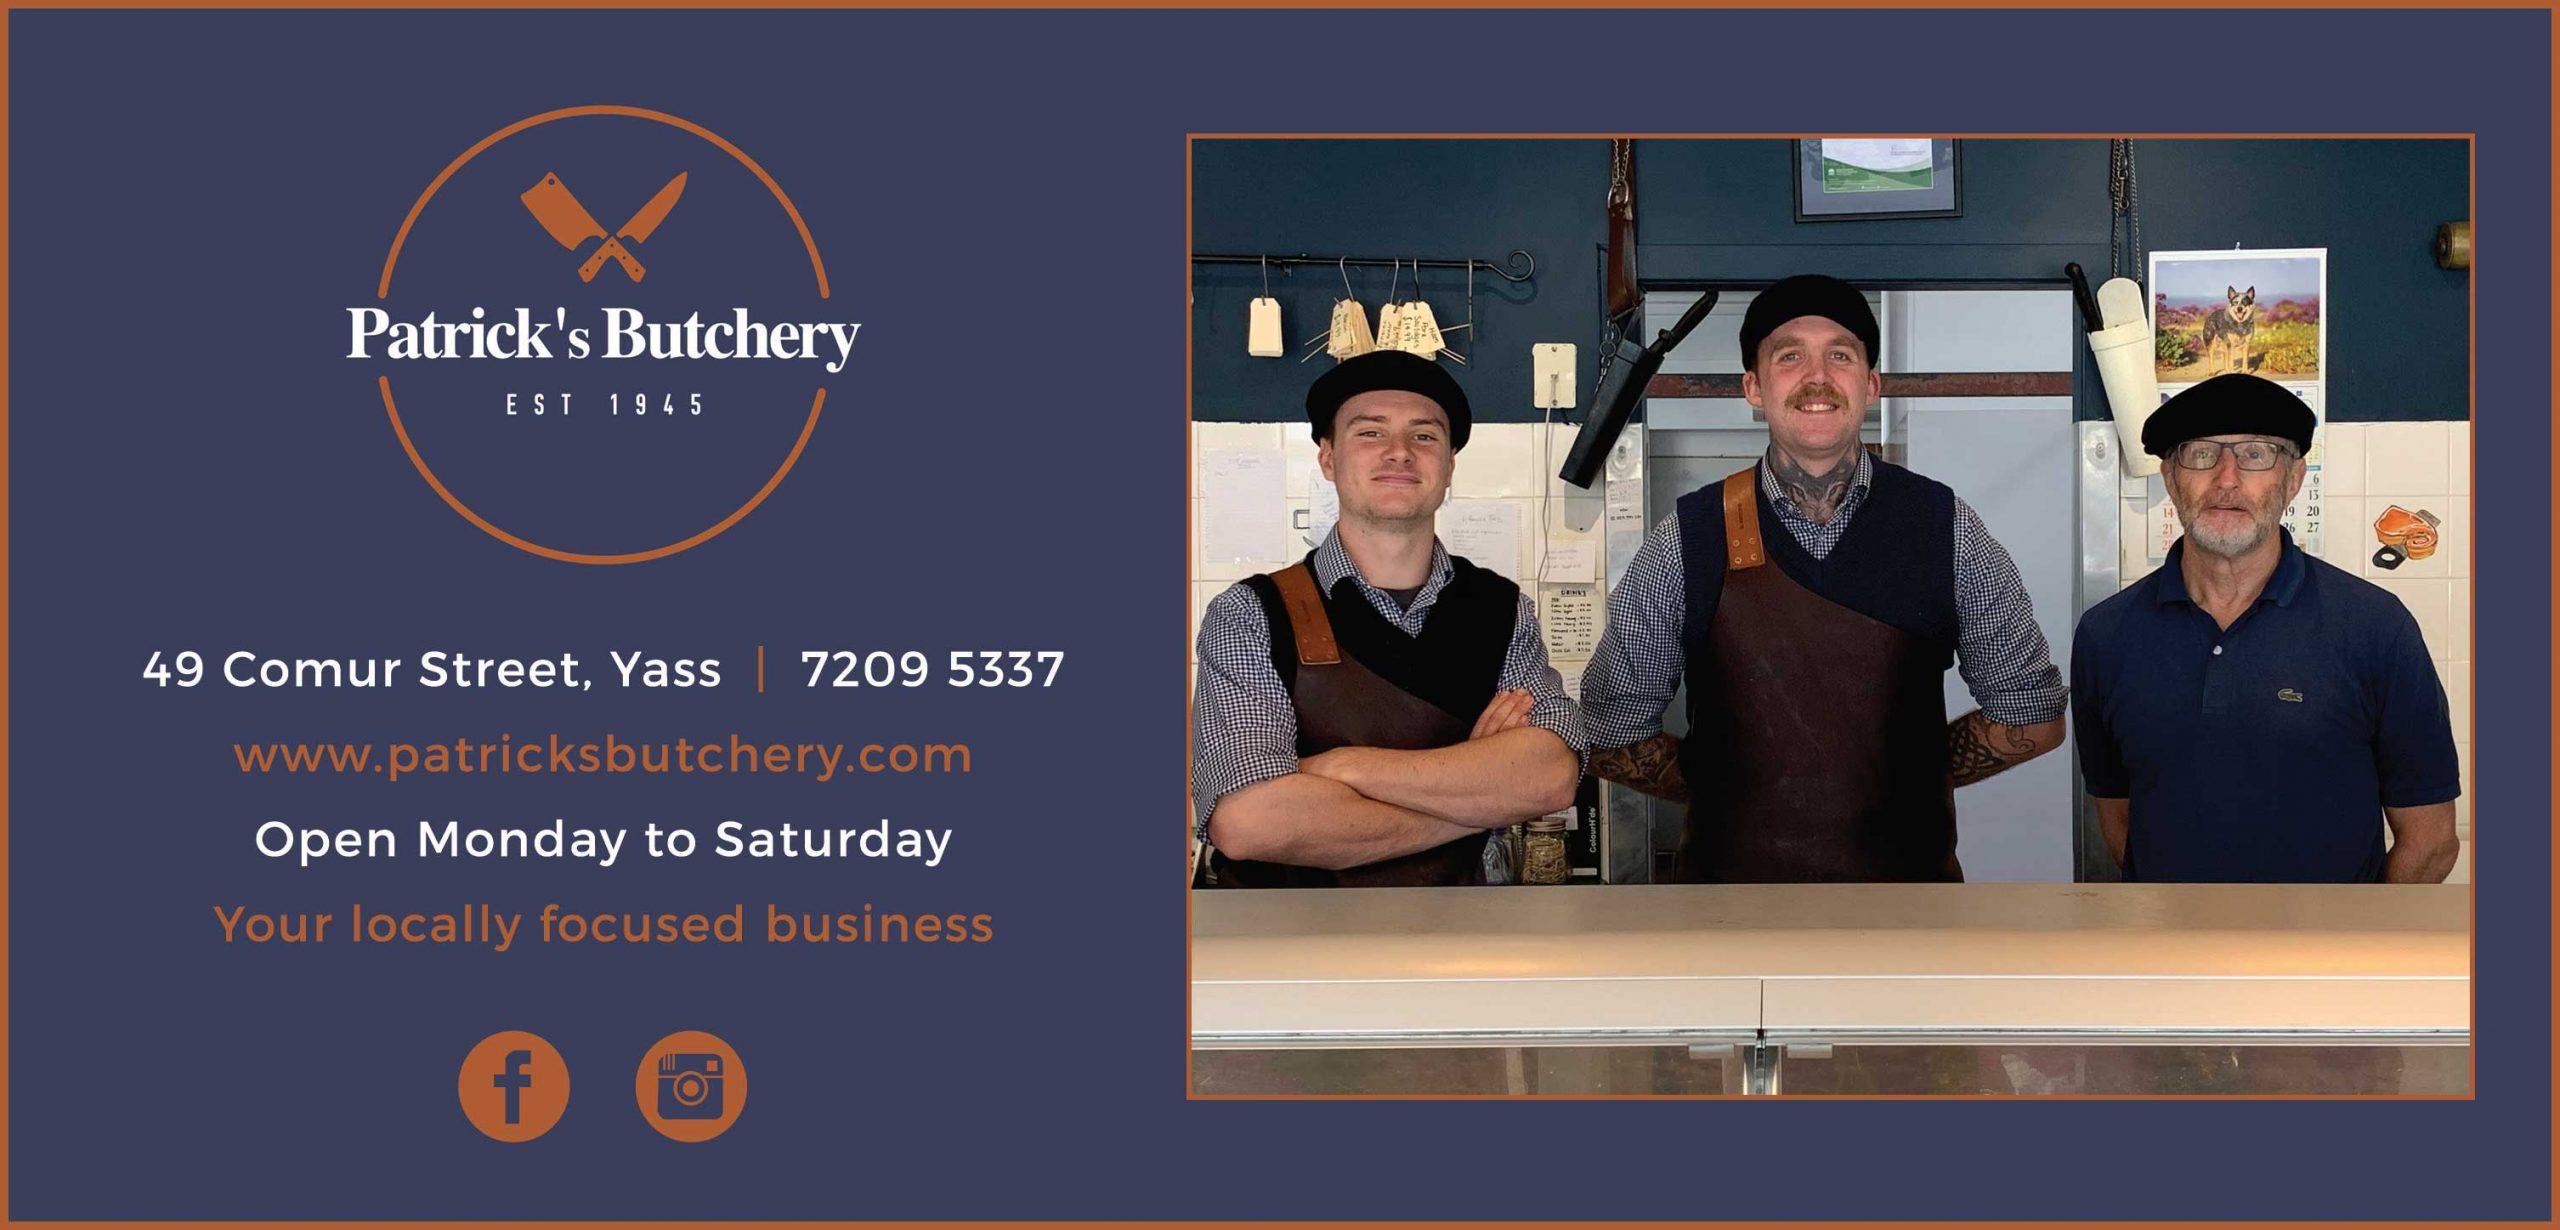 Ad for Patrick's butchery